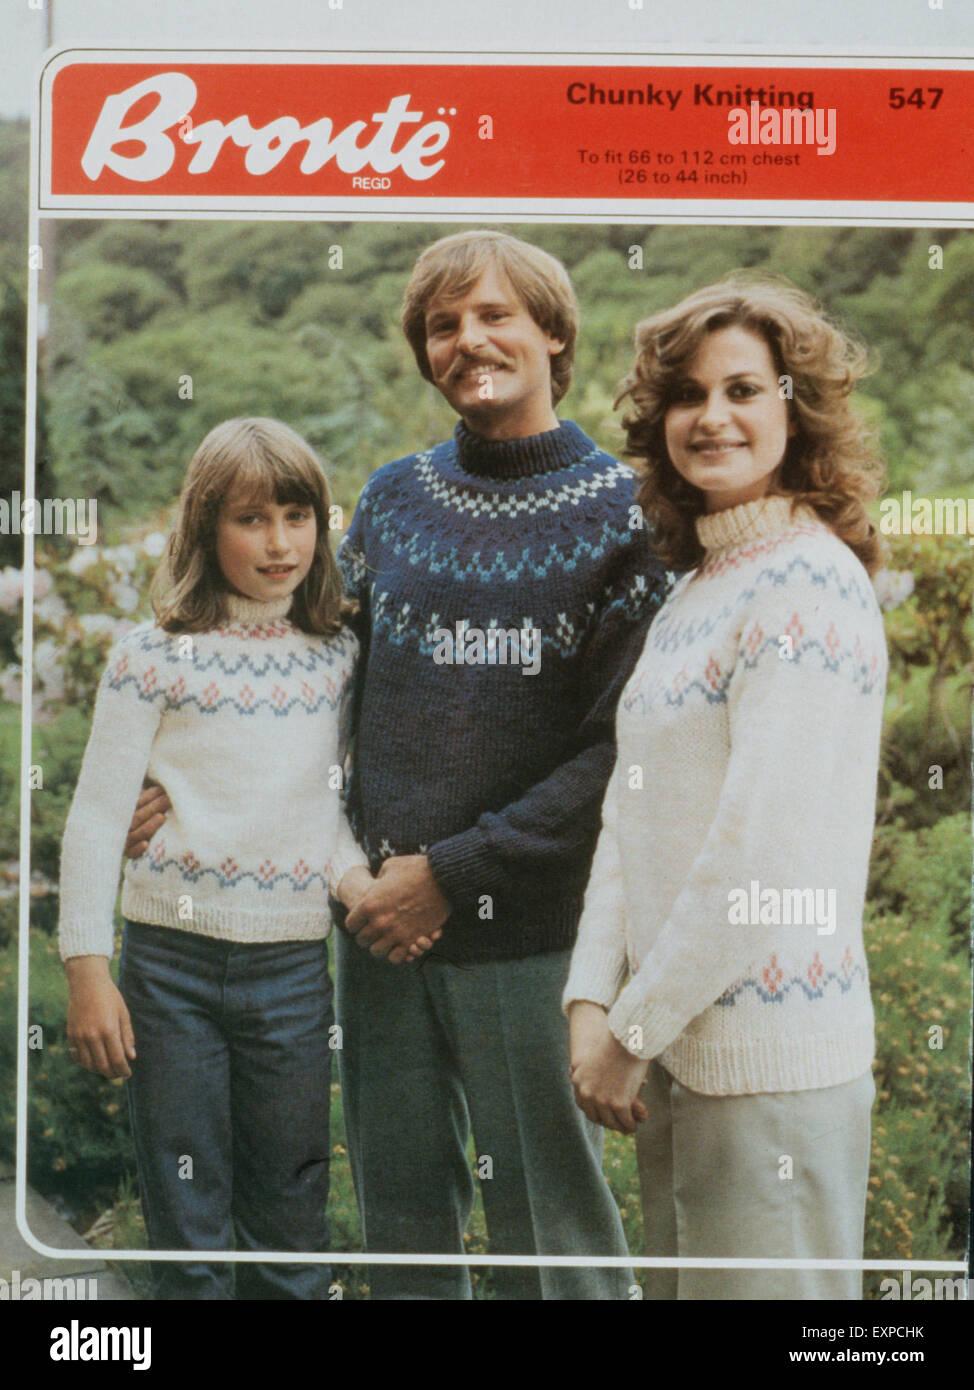 1970s UK Bronte Knitting Patterns Stock Photo: 85315375 - Alamy